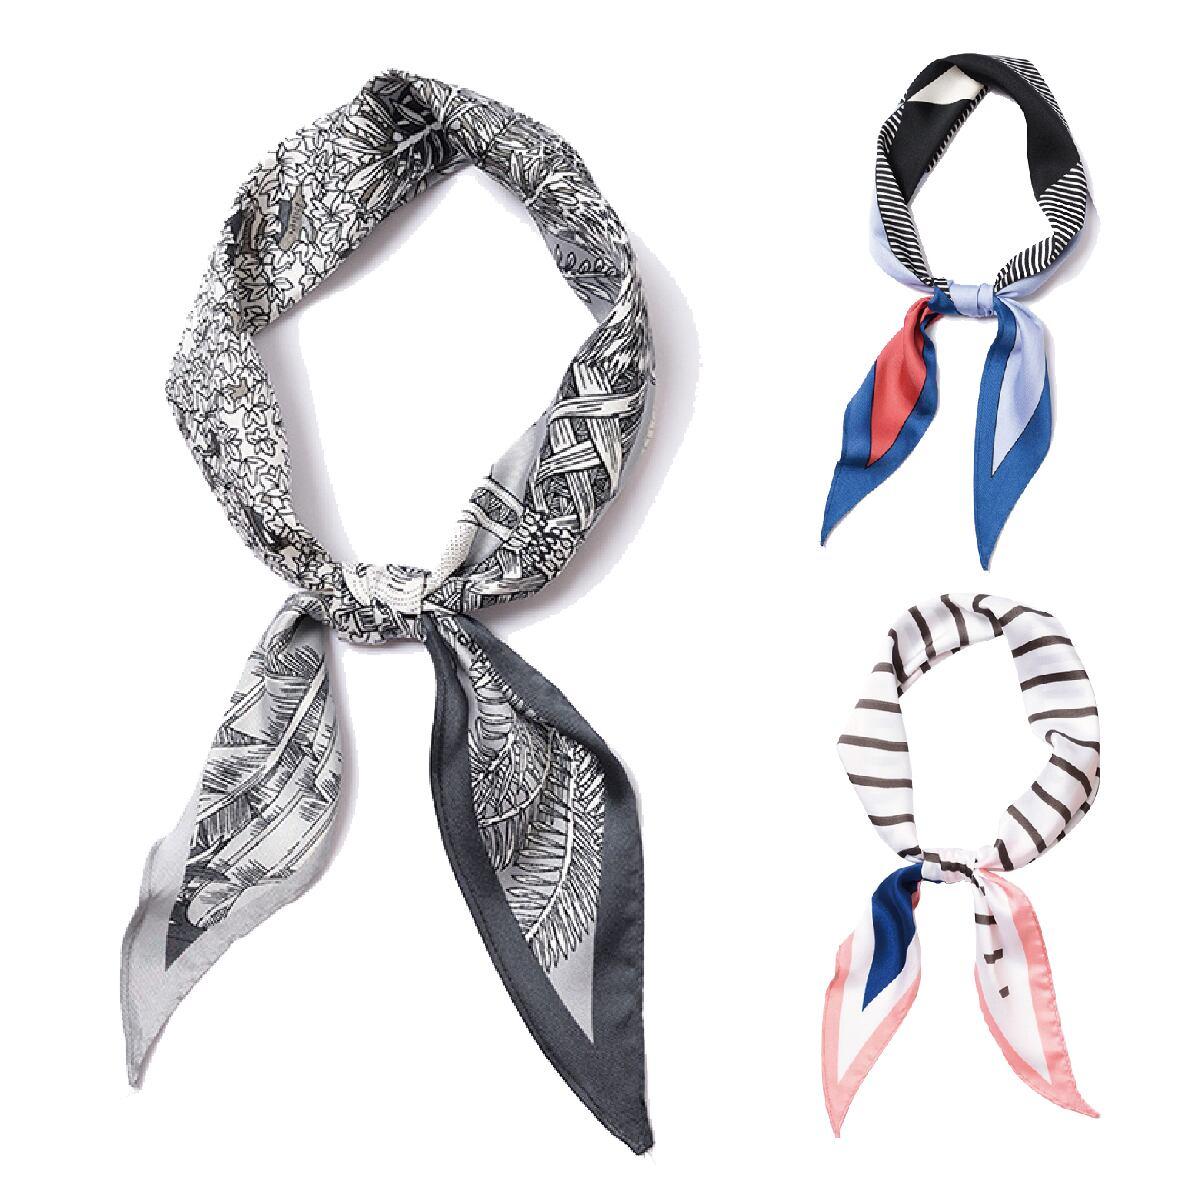 FOX FOUND ネッカチーフ ダイアモンド型 スカーフ